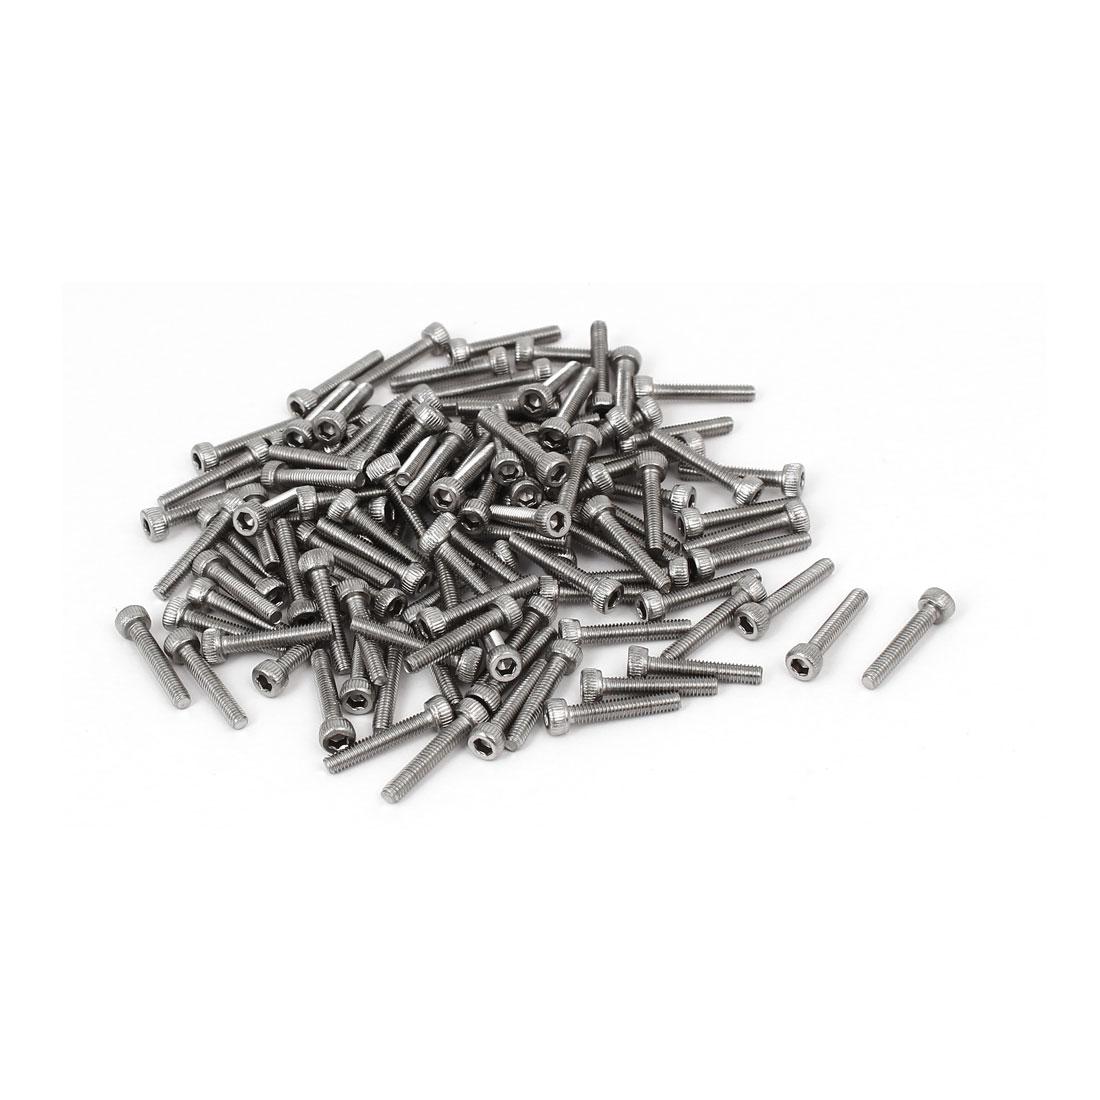 M2.5 x 14mm Thread 304 Stainless Steel Hex Socket Head Cap Screw DIN912 120pcs